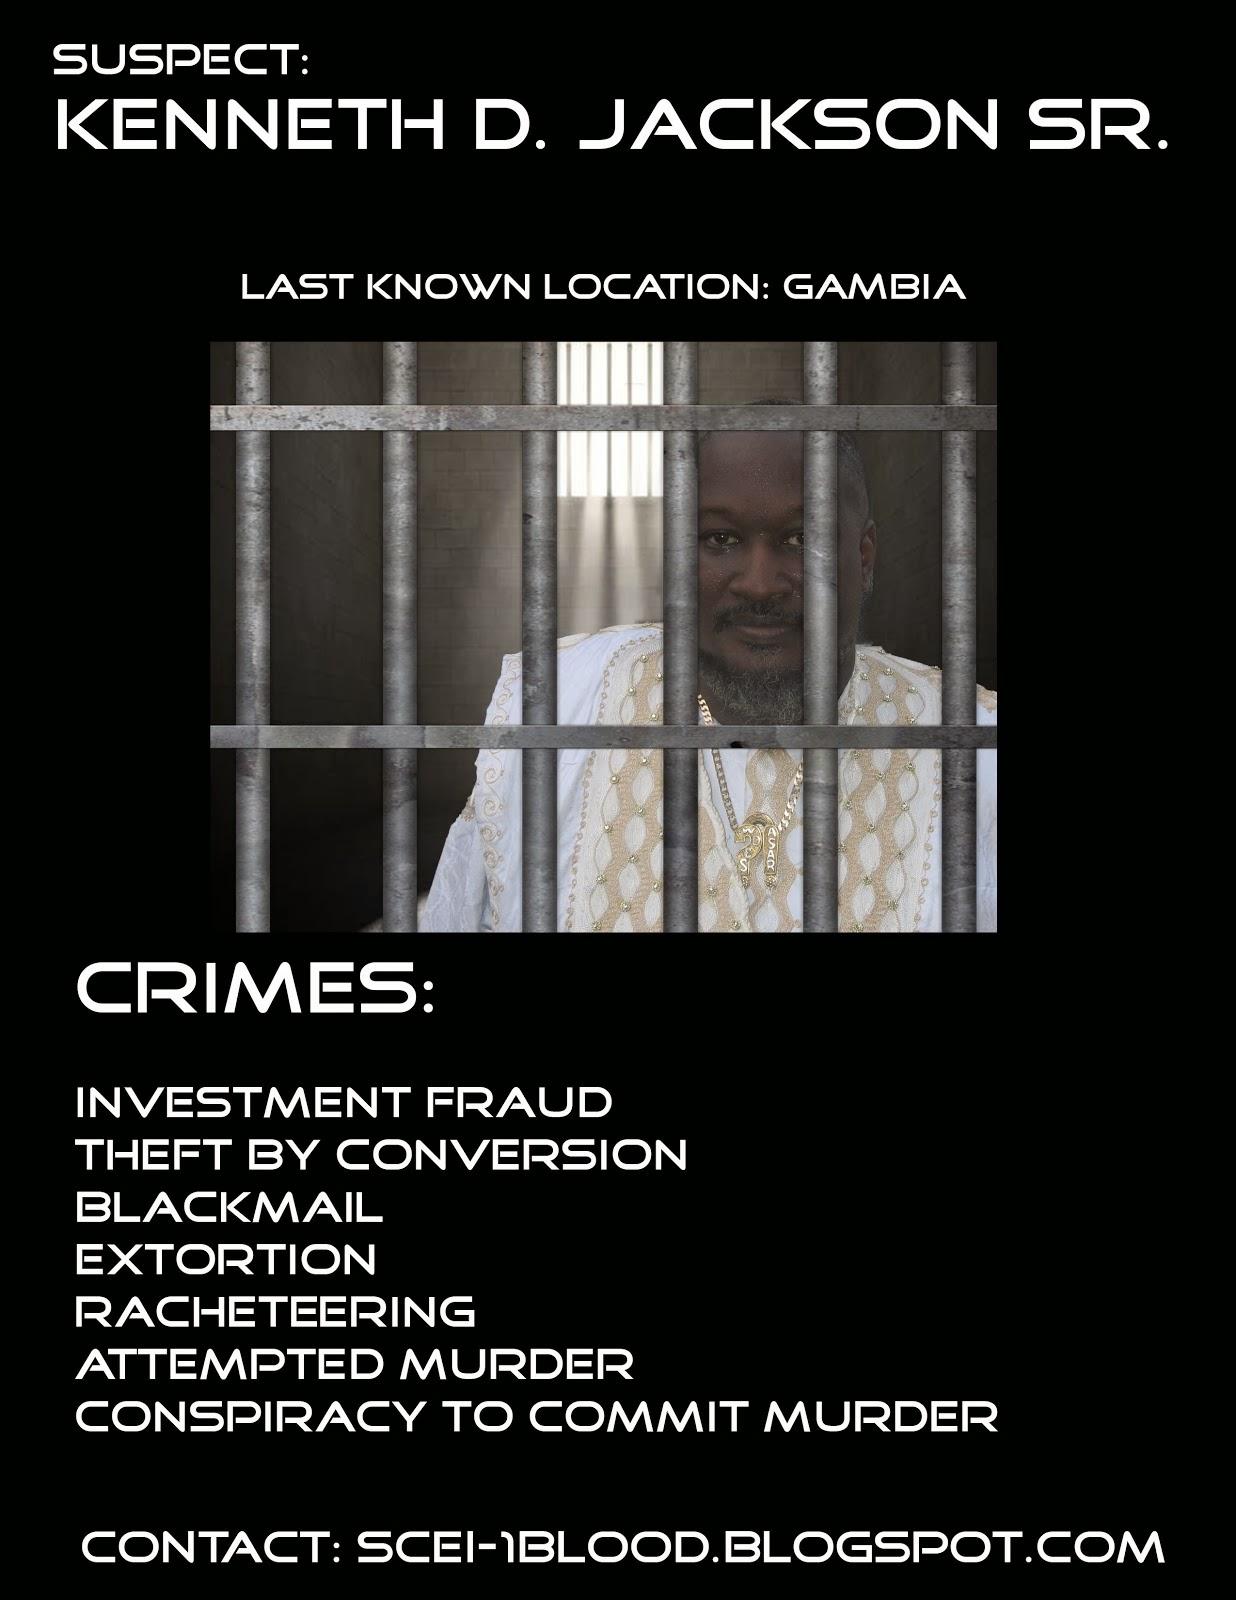 SATIRE: Ambassador Kenneth D Jackson Wanted